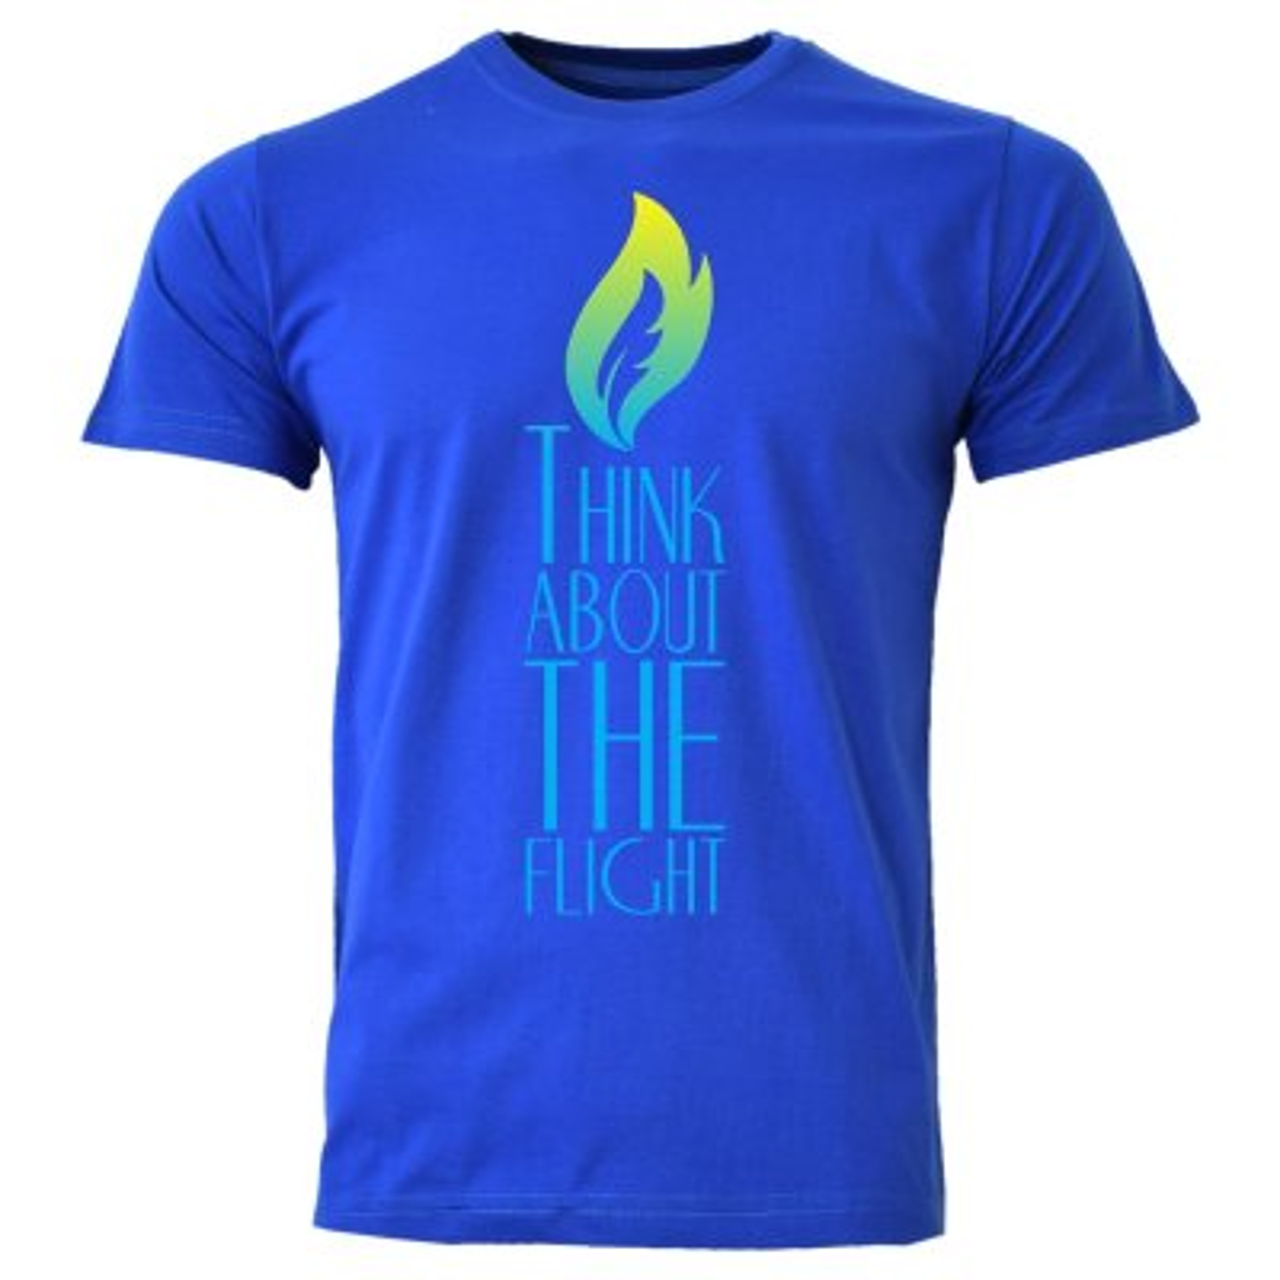 تیشرت مردانه طرح شمع کد LP3 رنگ آبی